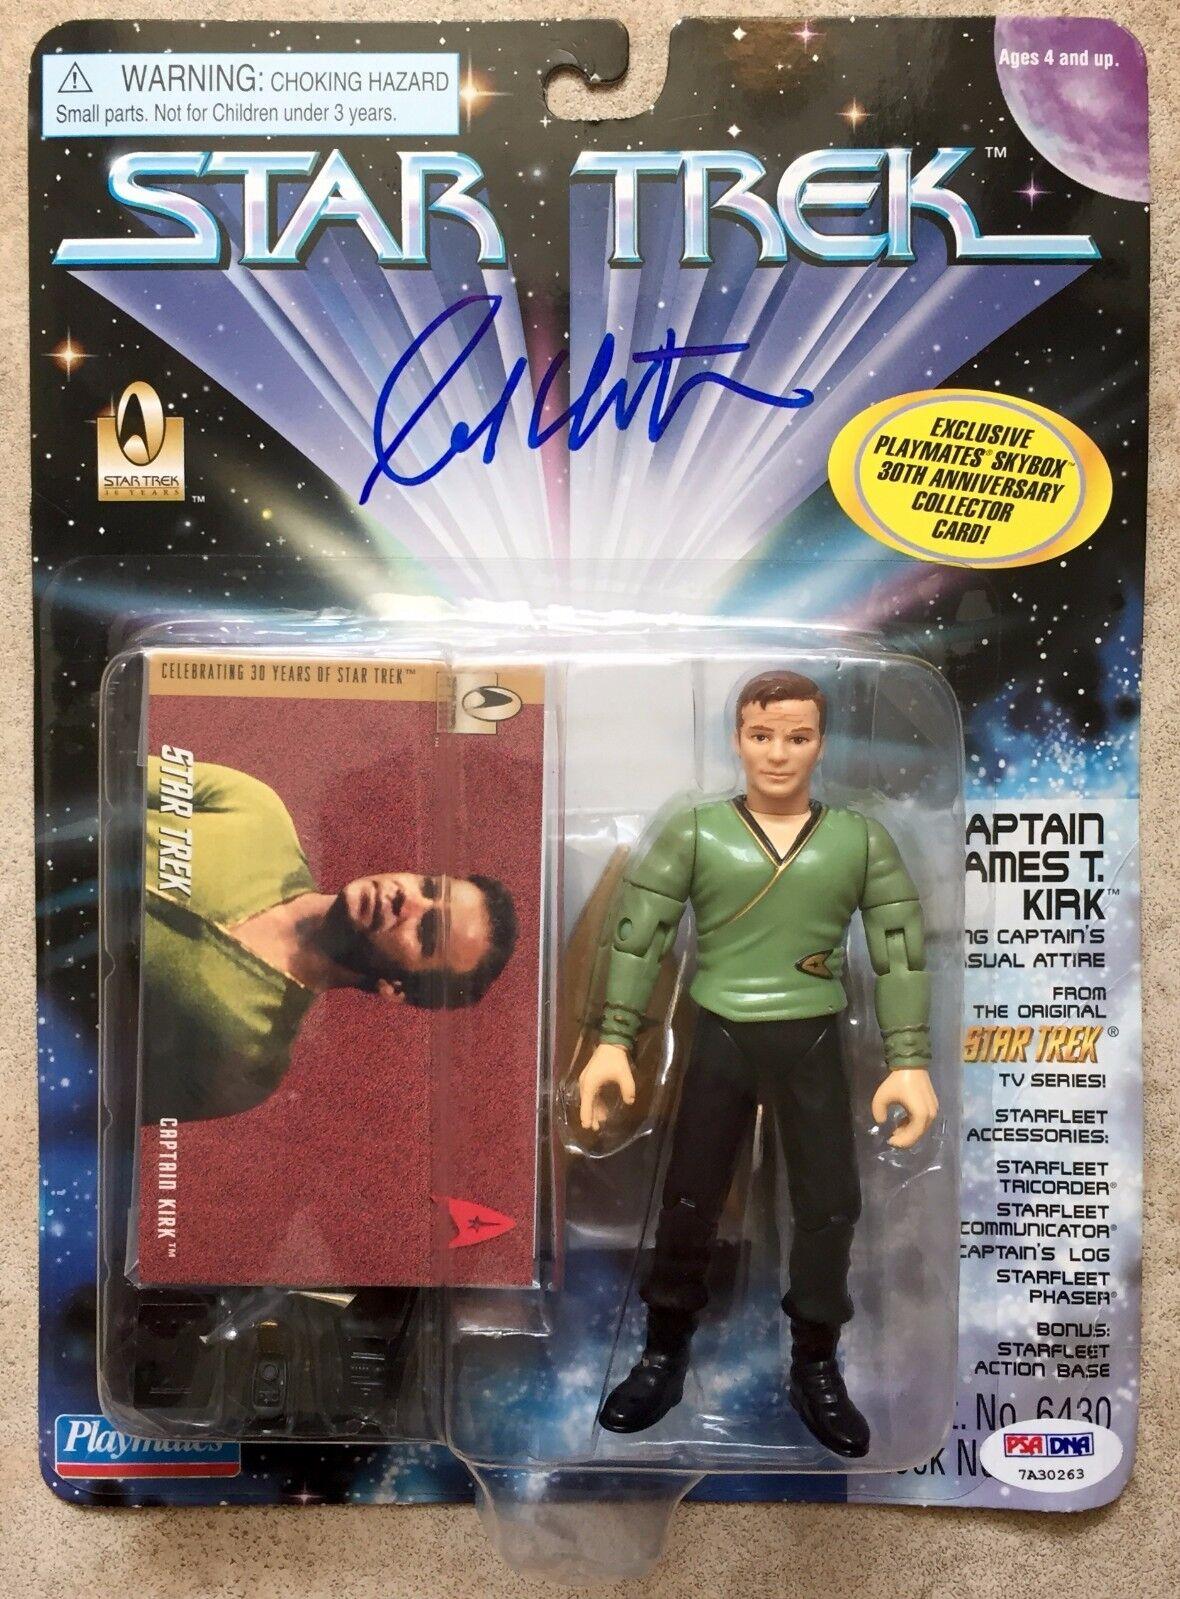 1996 William Shatner Signed Star Trek Playmates Captain Kirk Figure PSA DNA COA